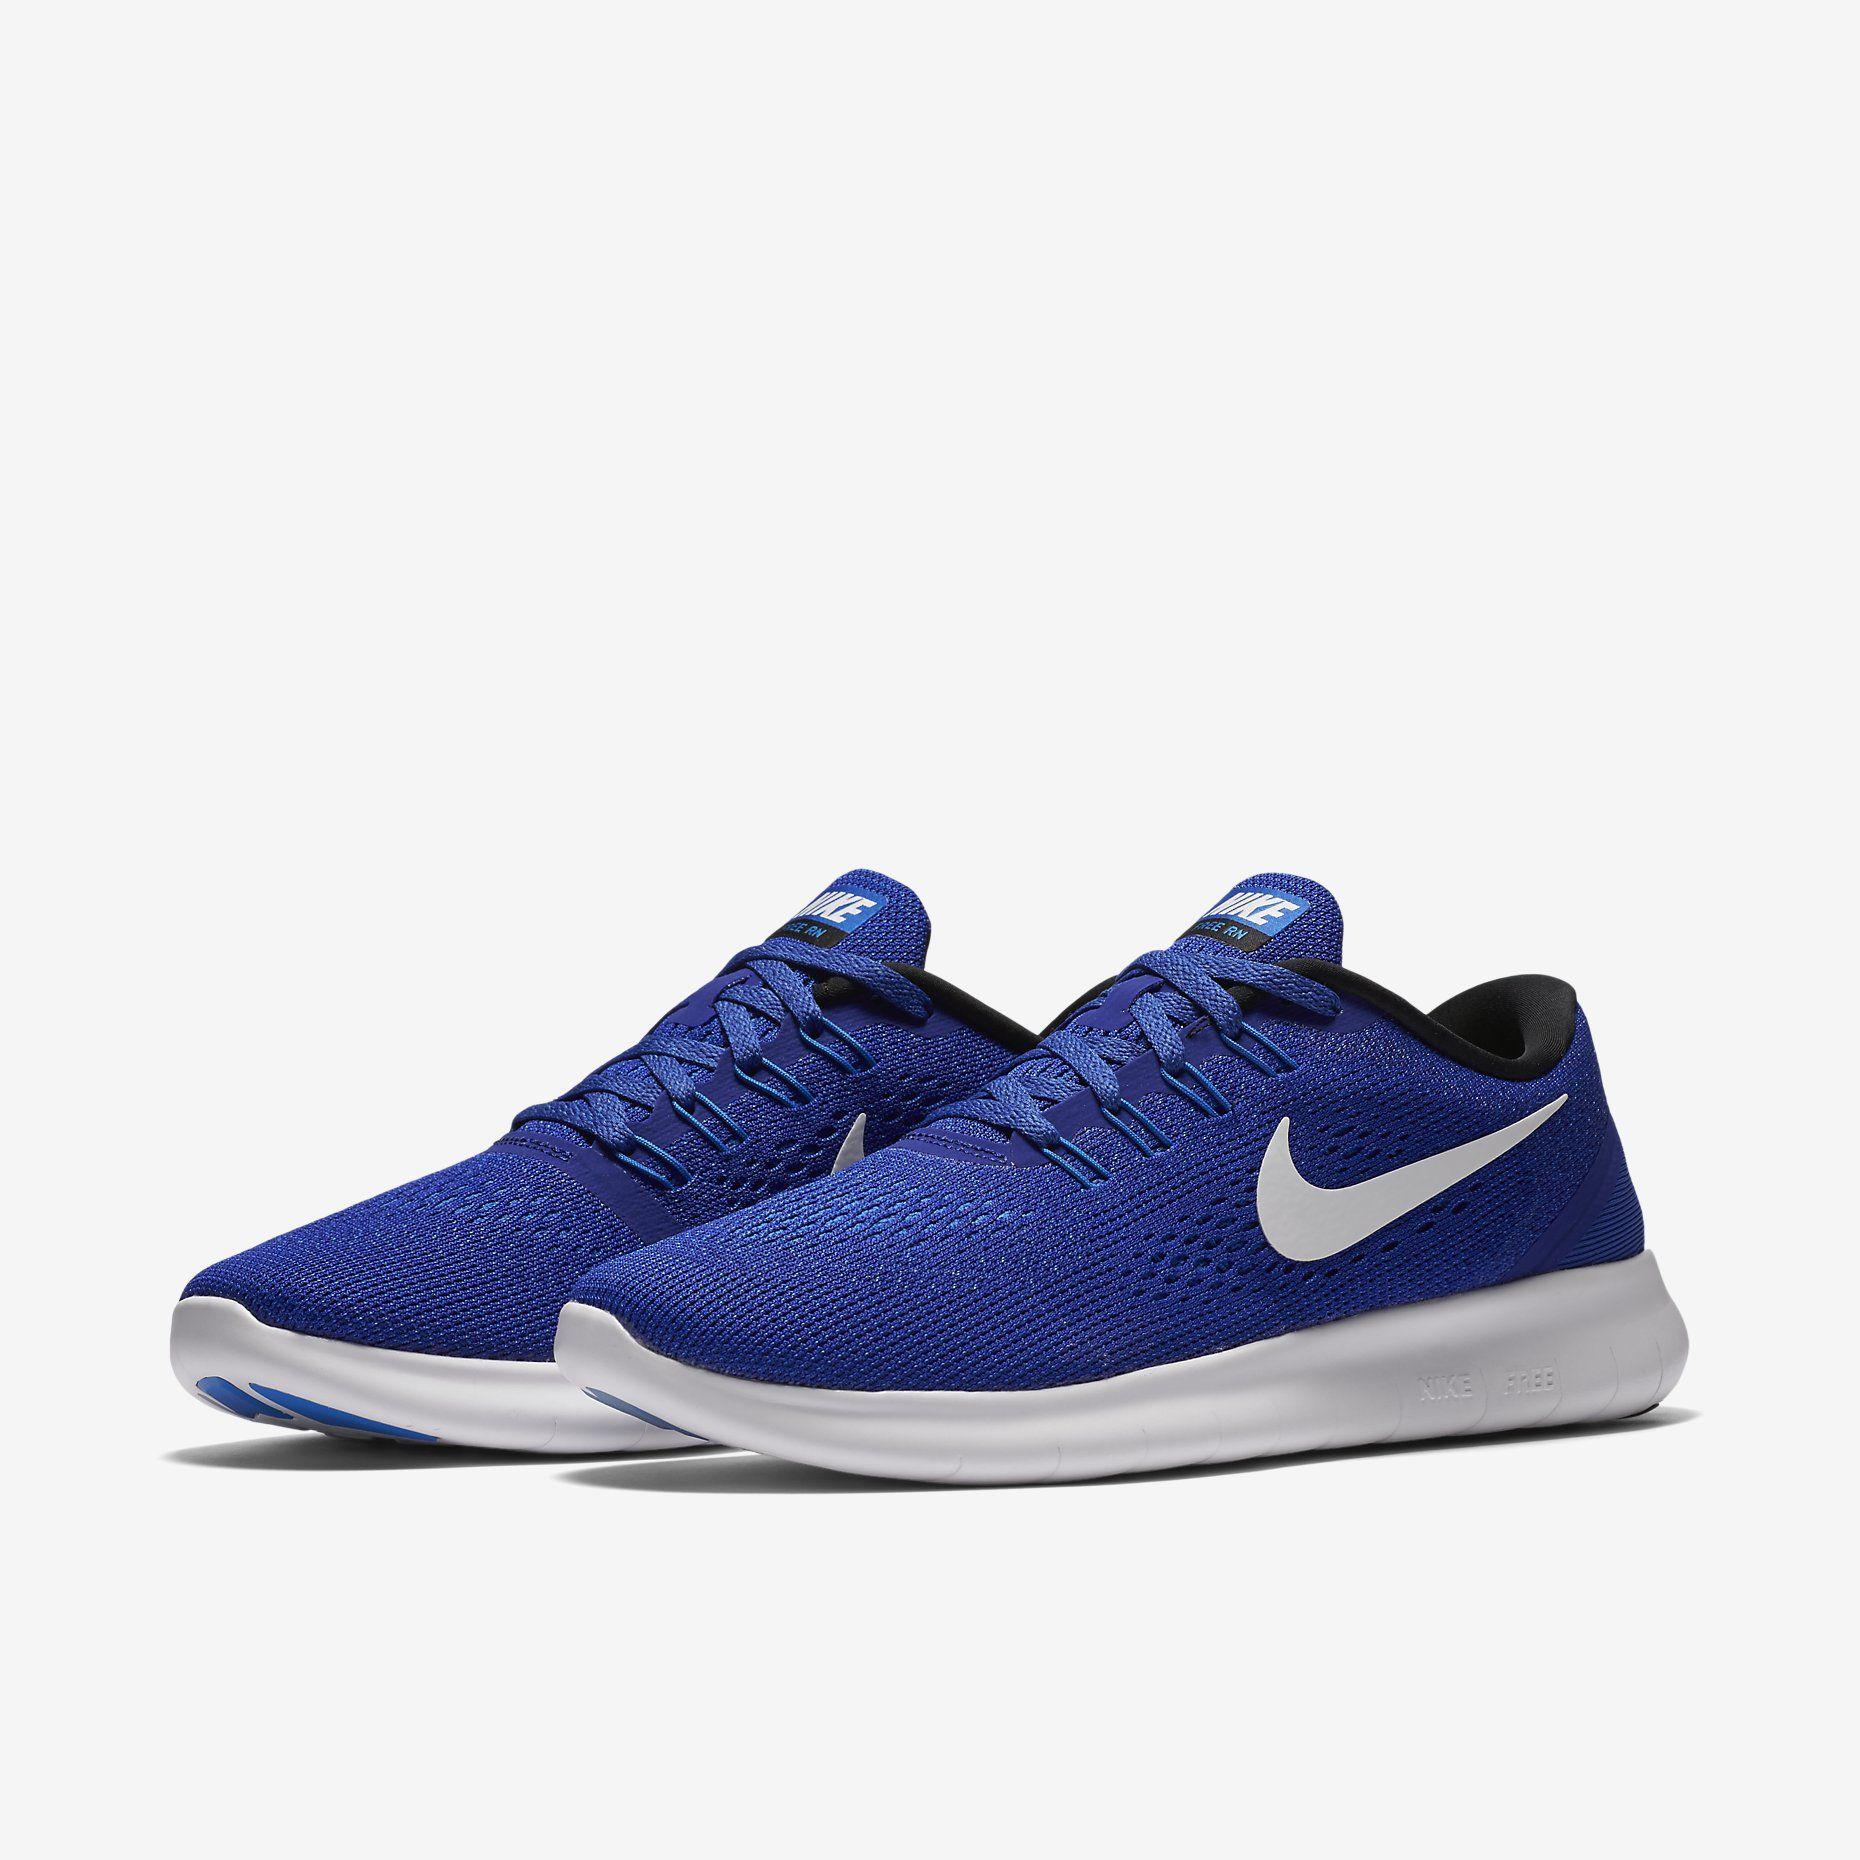 Discount Tennis Apparel Nike